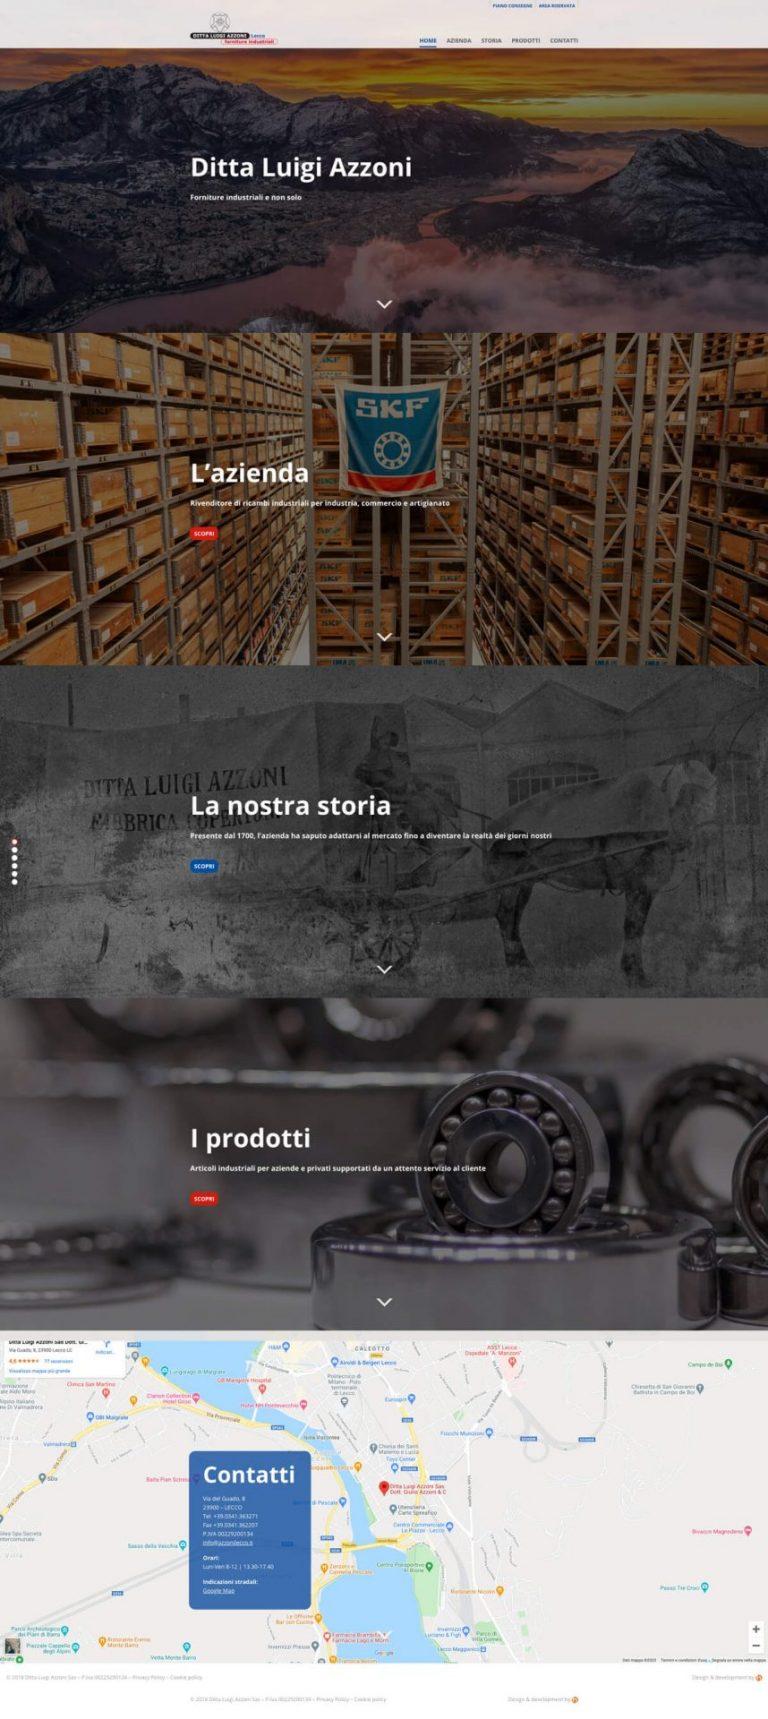 Kreas website azzonilecco home